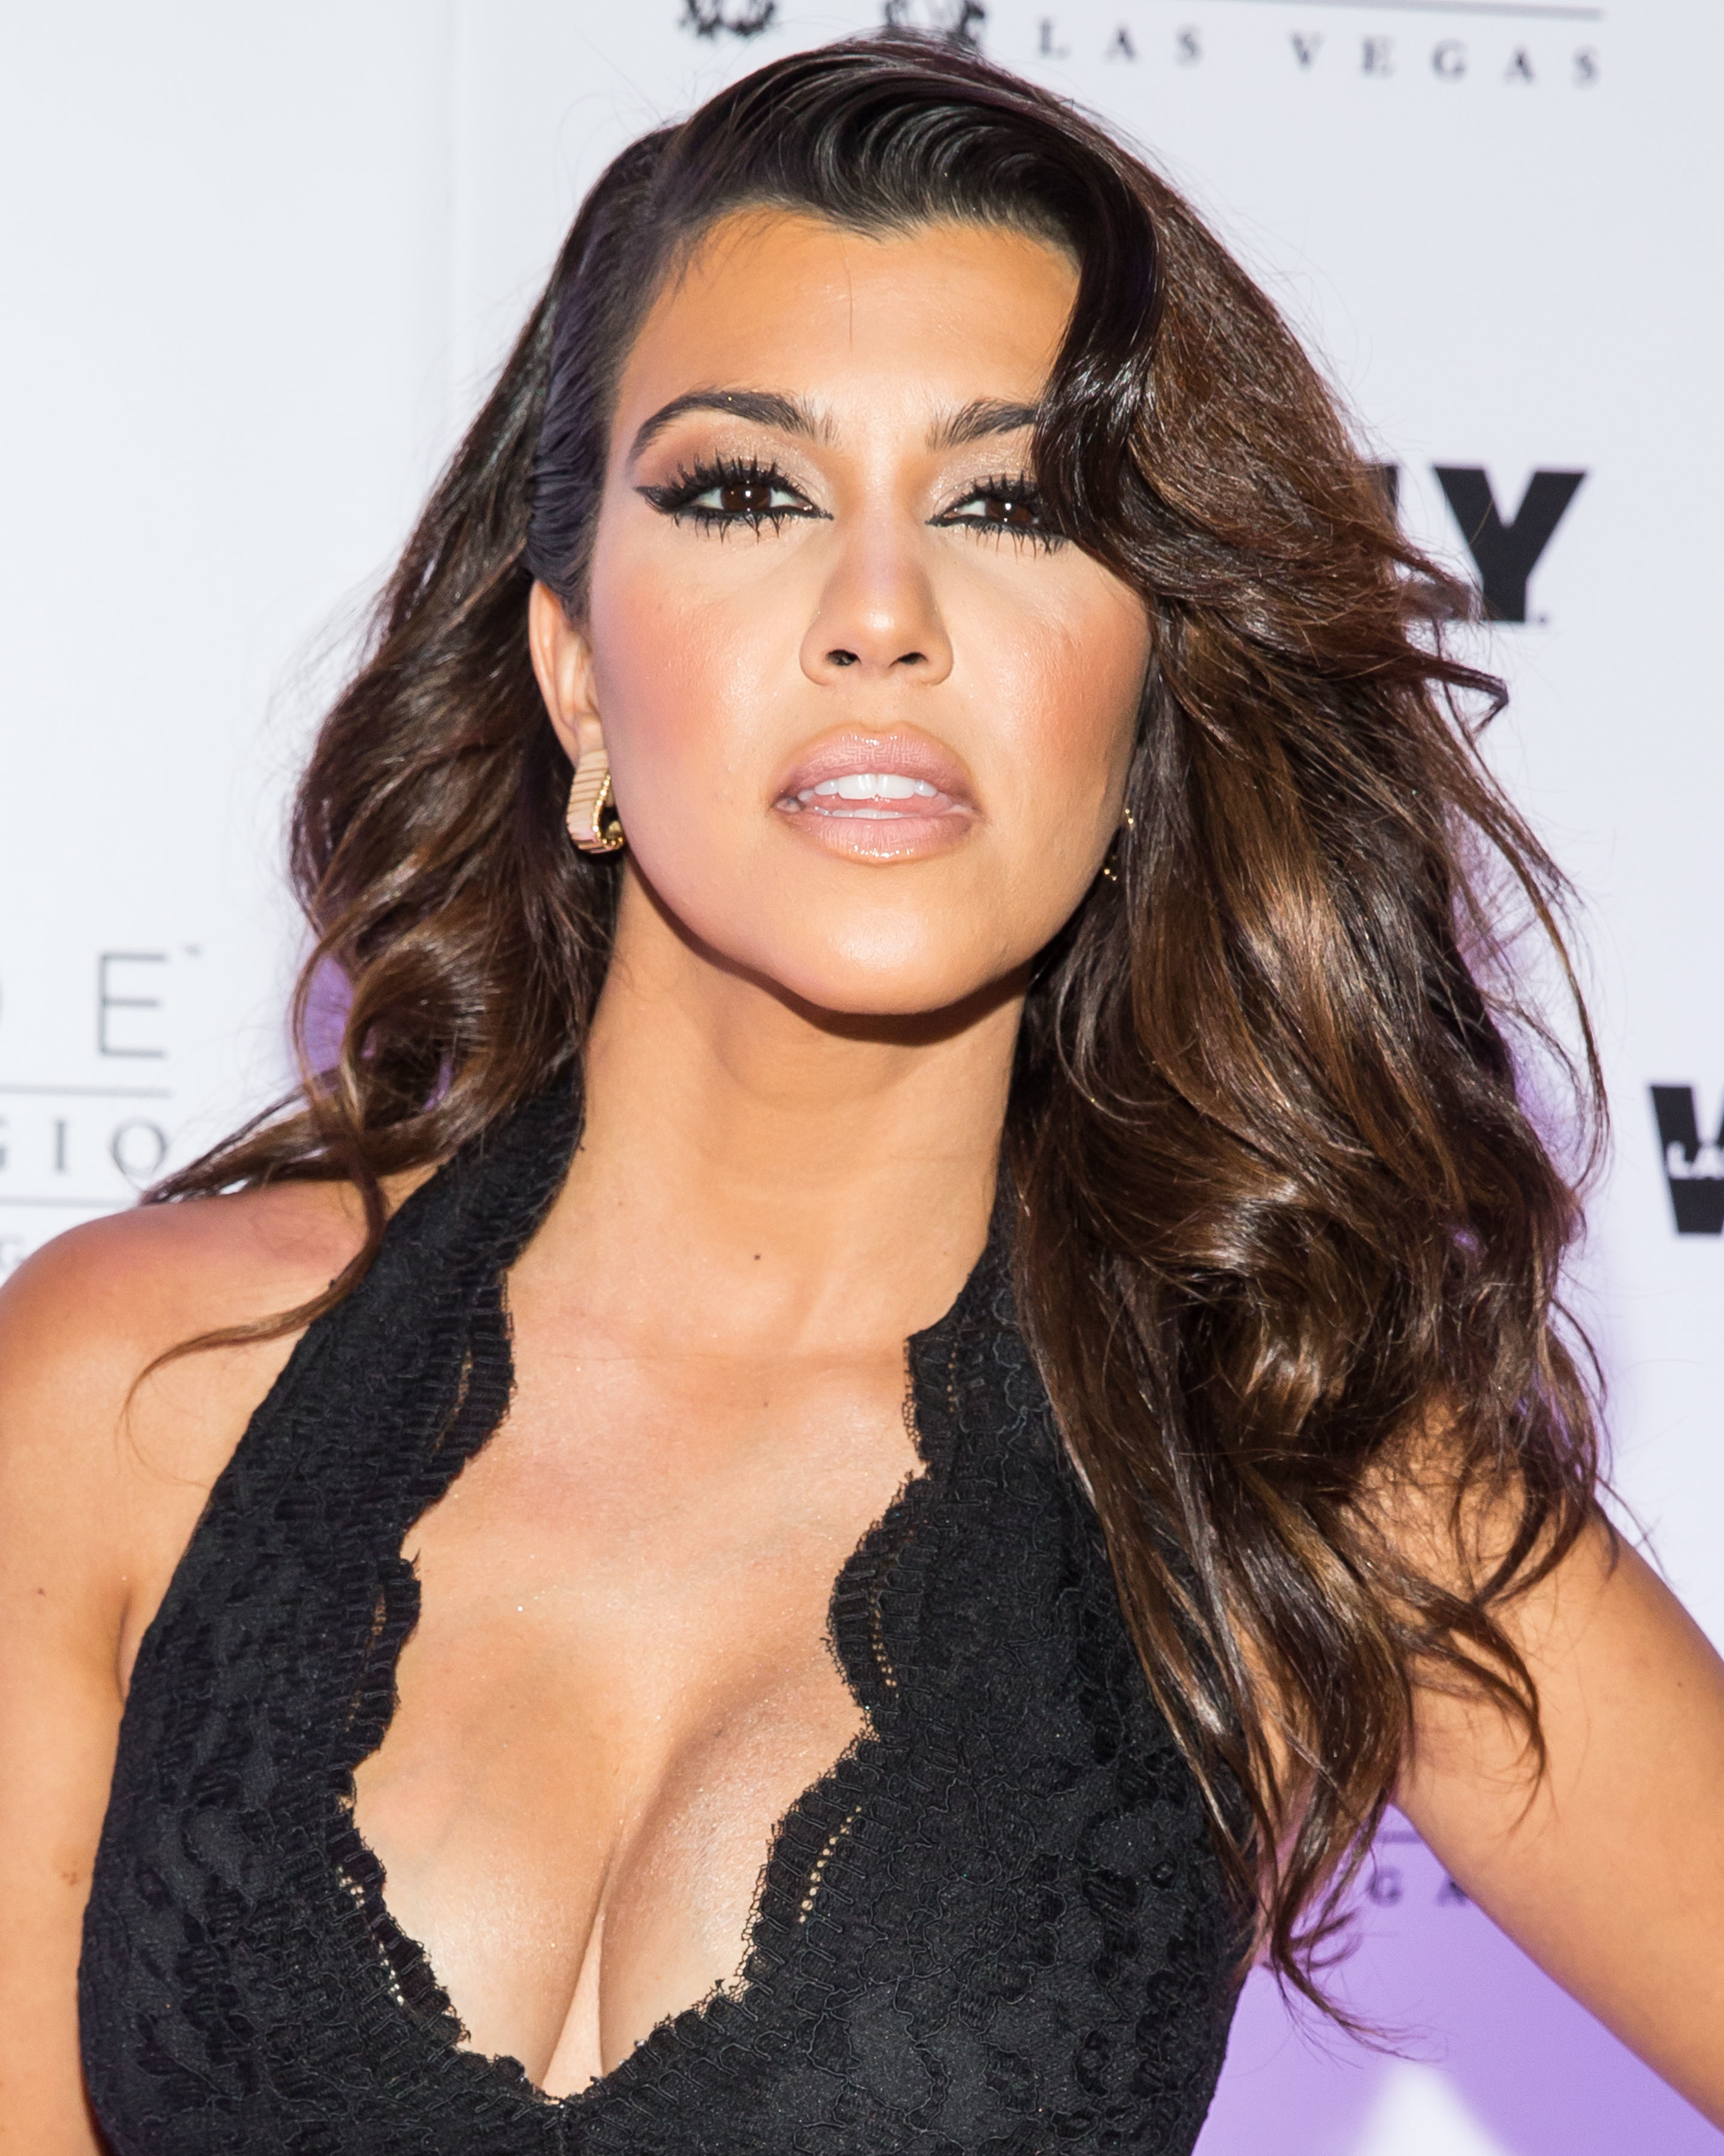 Kourtney Kardashian Boob Job Surgery Vip